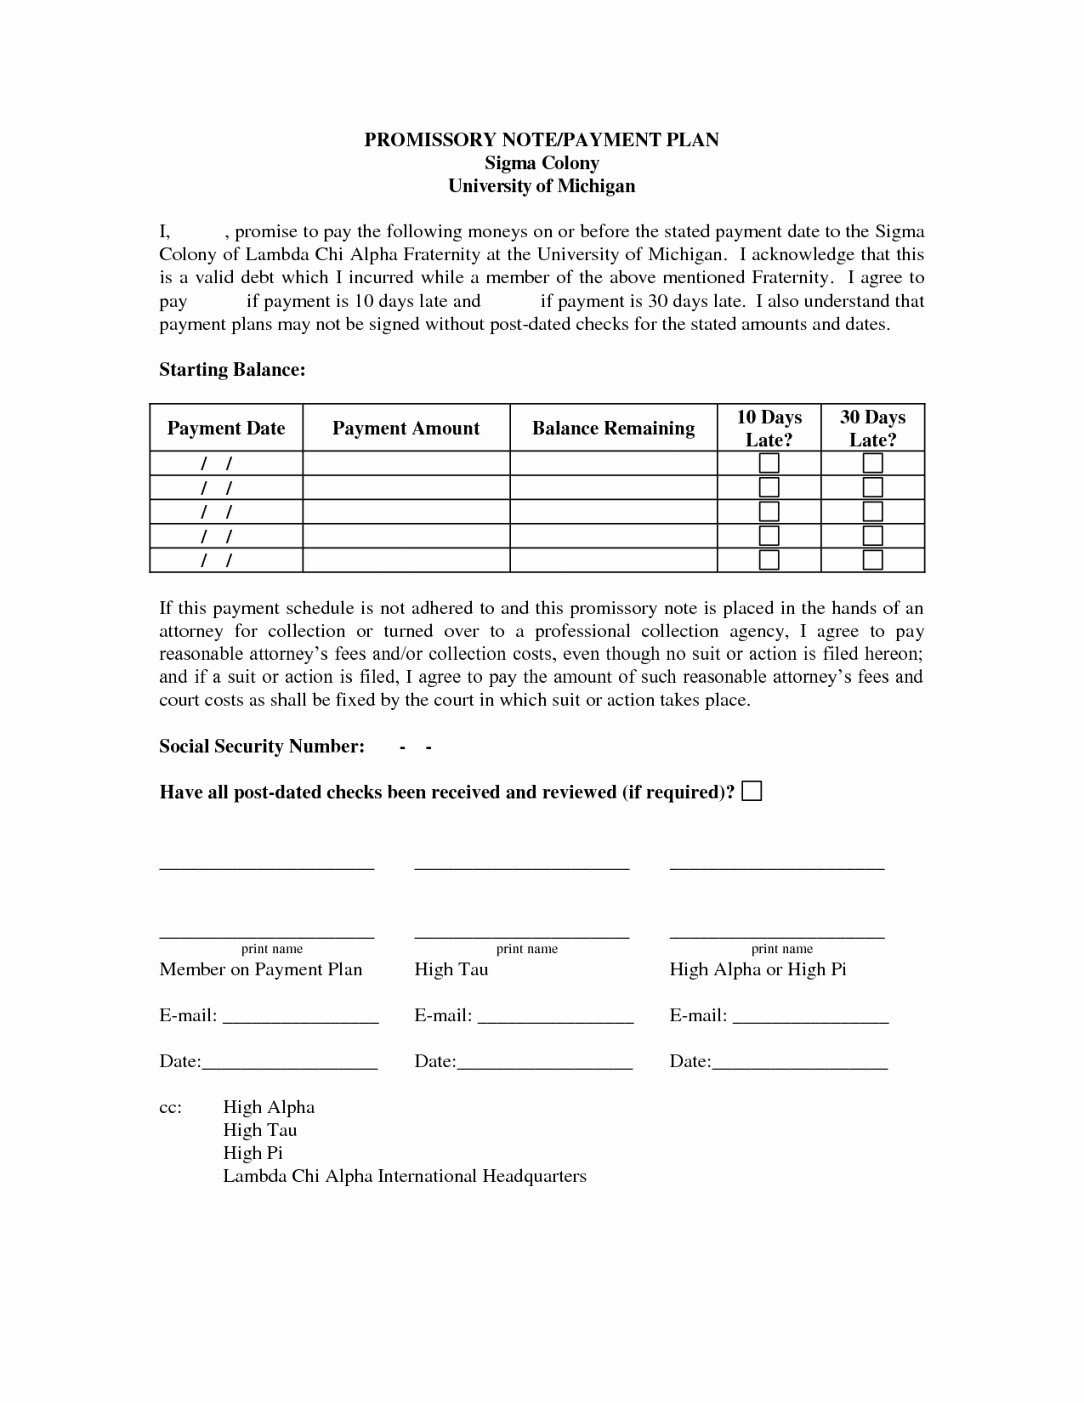 Installment Payment Agreement Template Unique Payment Plan Letter Barcafontanacountryinn Installment